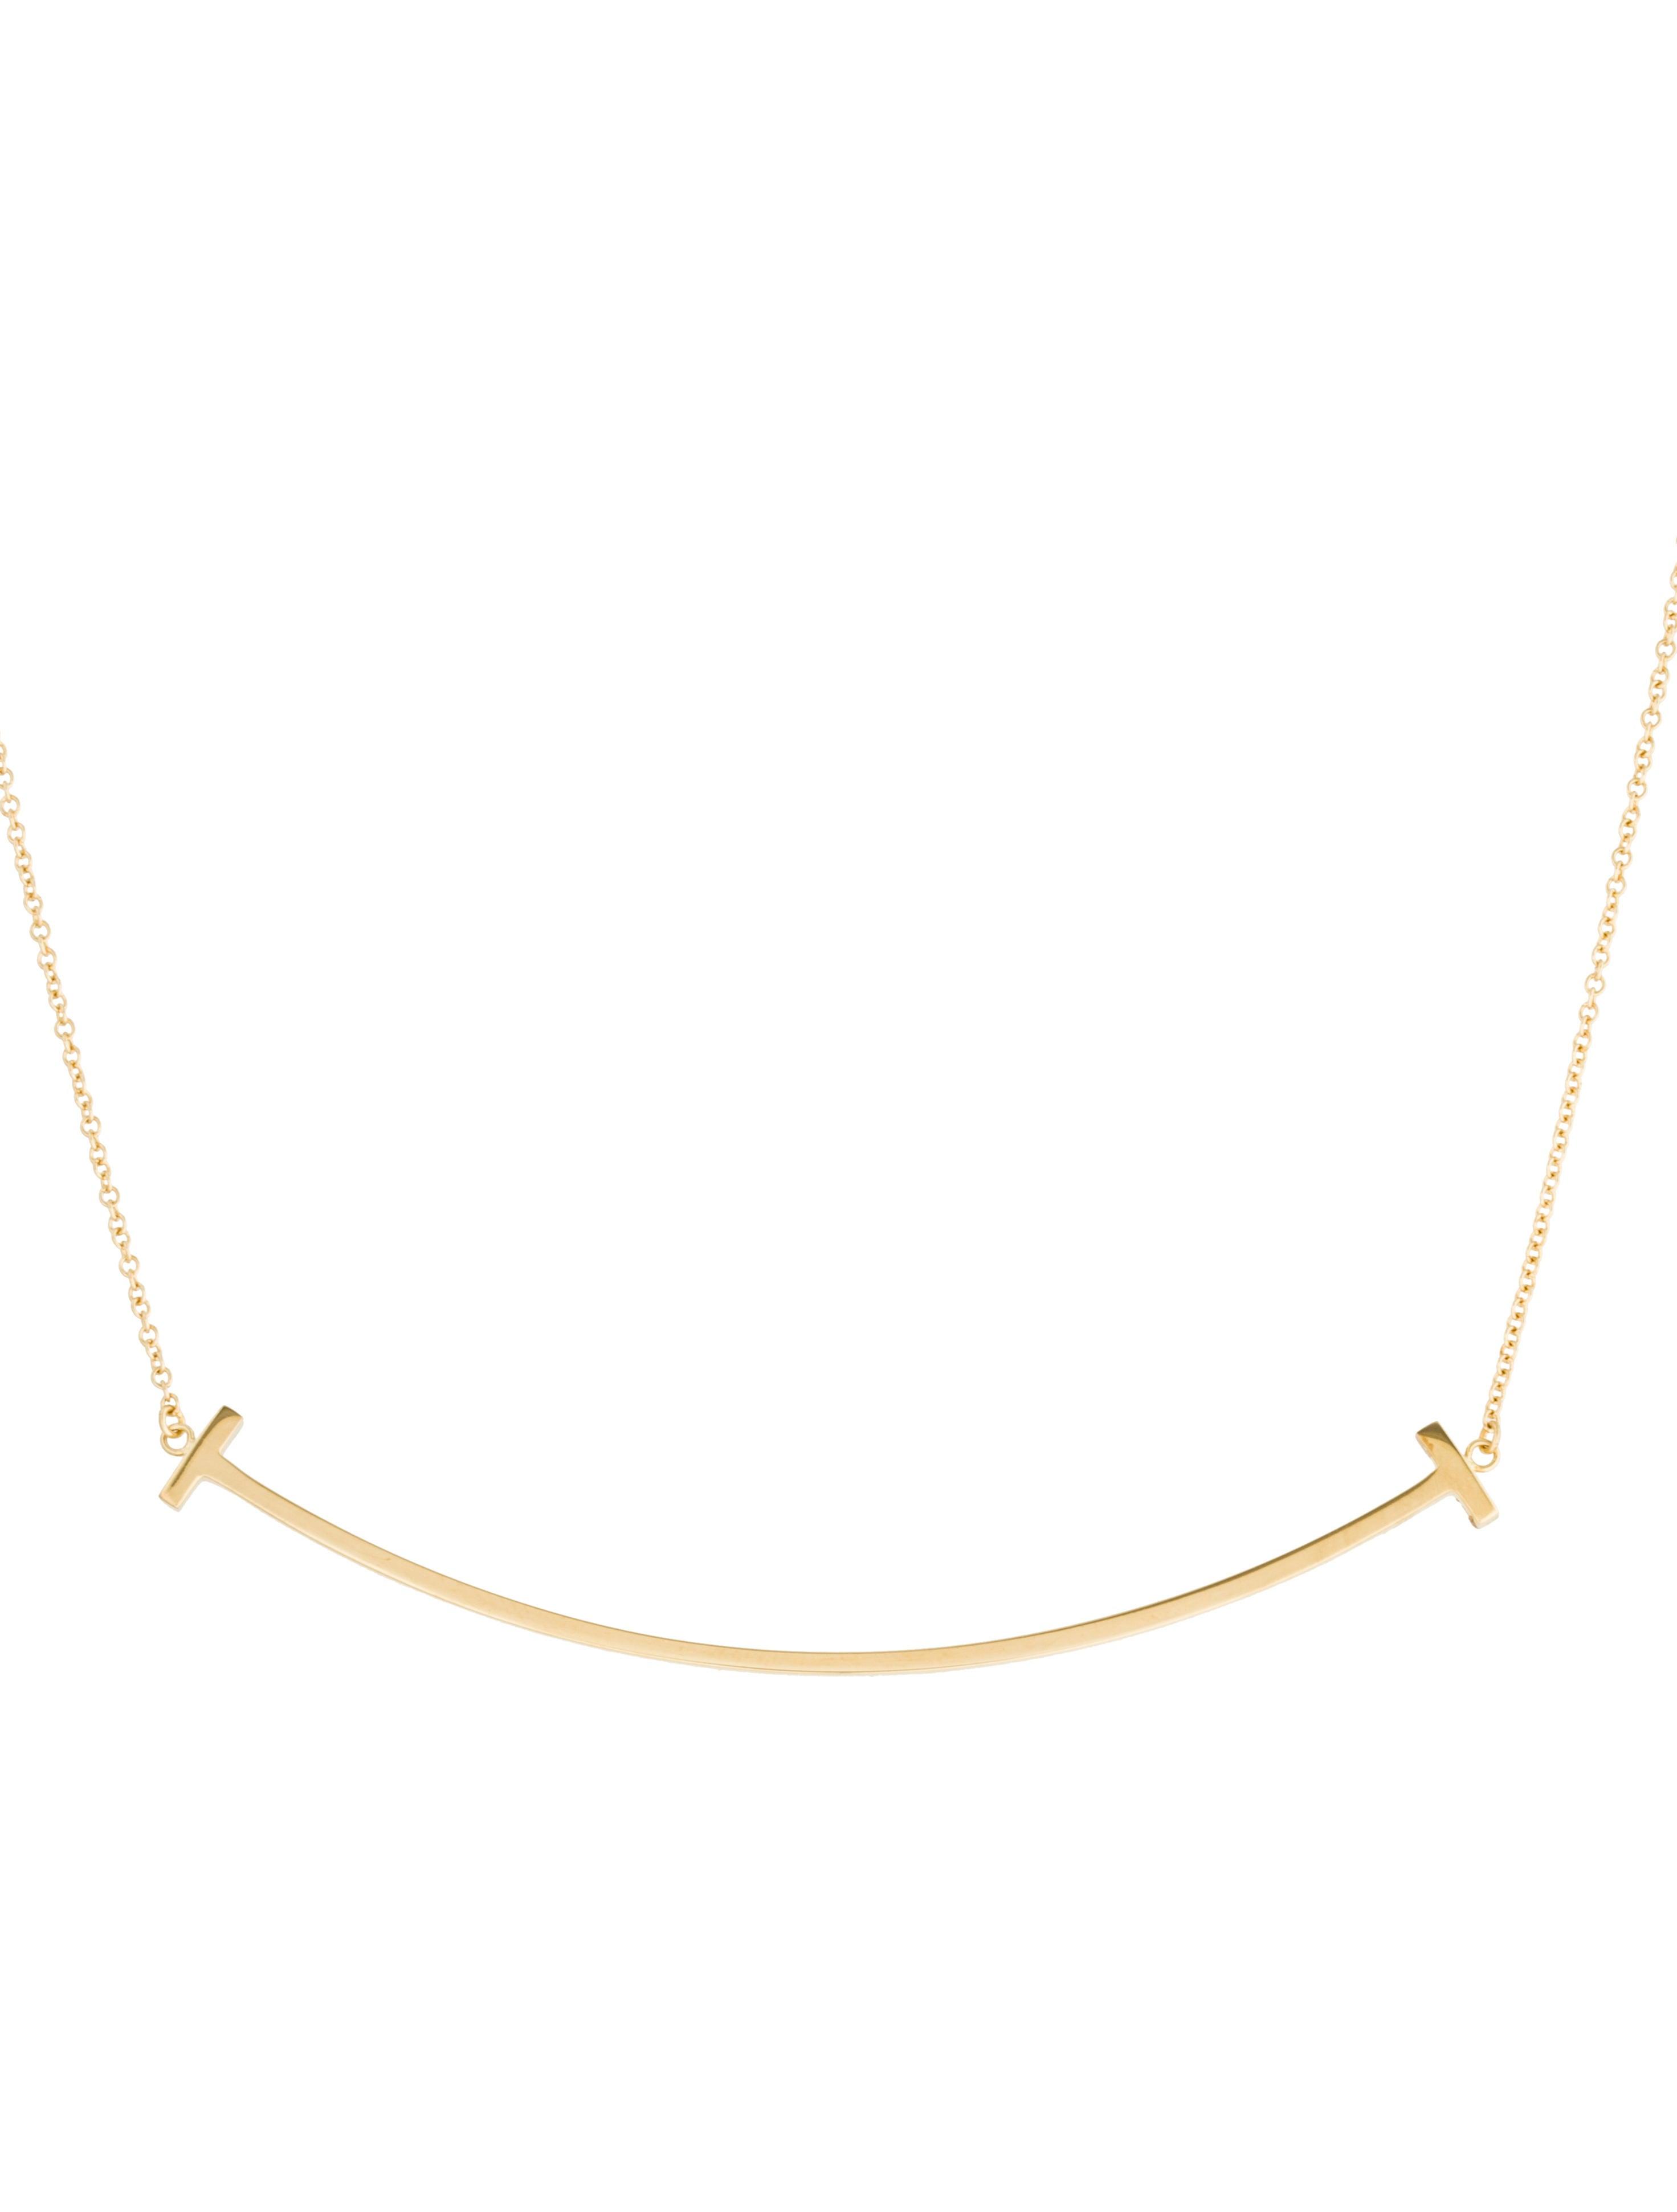 b9c7c2bad Tiffany & Co. 18K Tiffany T Smile Pendant Necklace - Necklaces ...